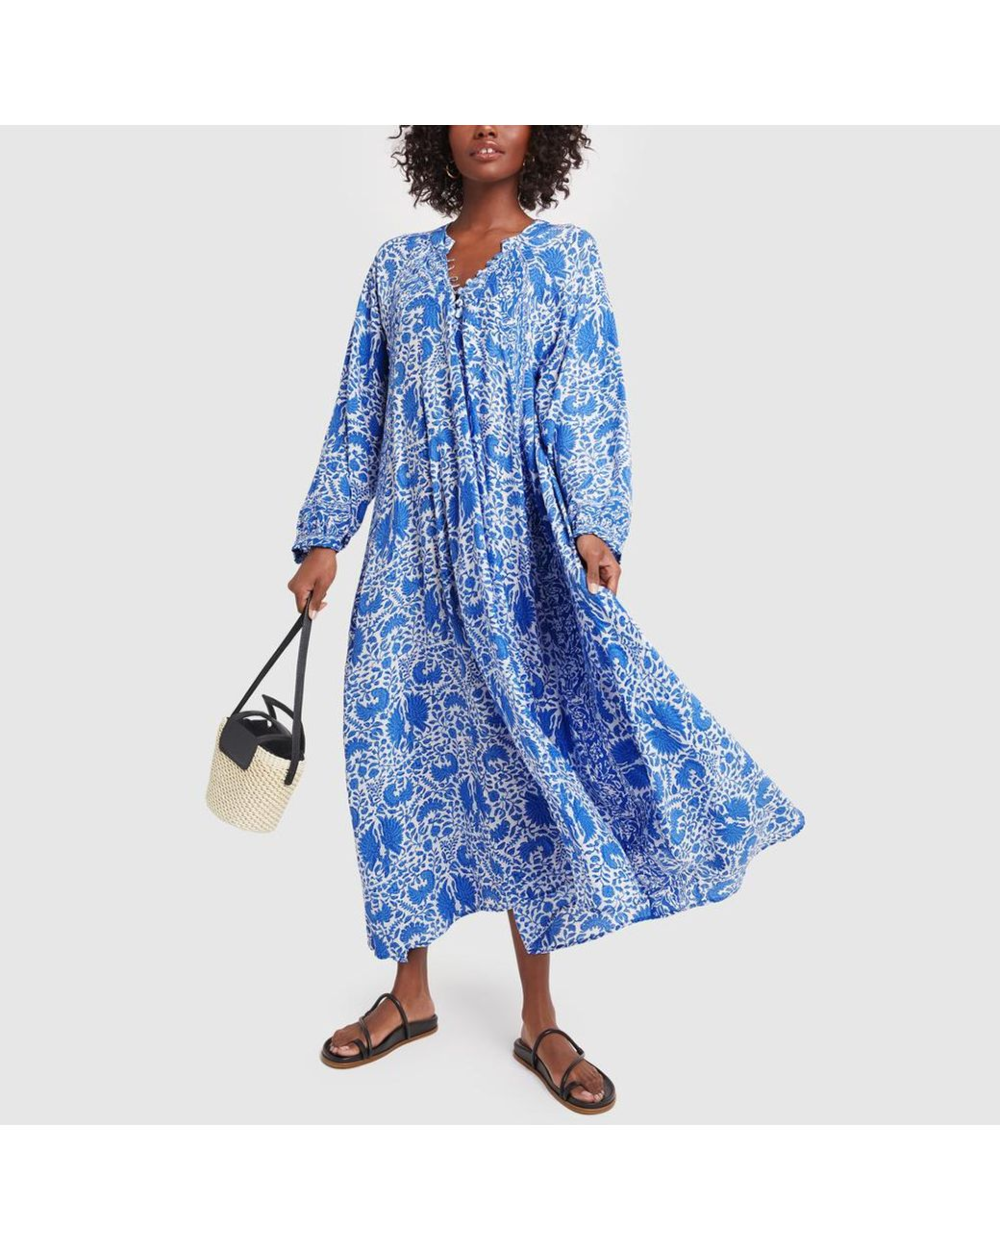 Natalie Martin Silk Fiore Maxi Dress In Blue Lyst Floral Wrap Maxi Dress Short Dress White Stevie Dress [ 1250 x 1000 Pixel ]